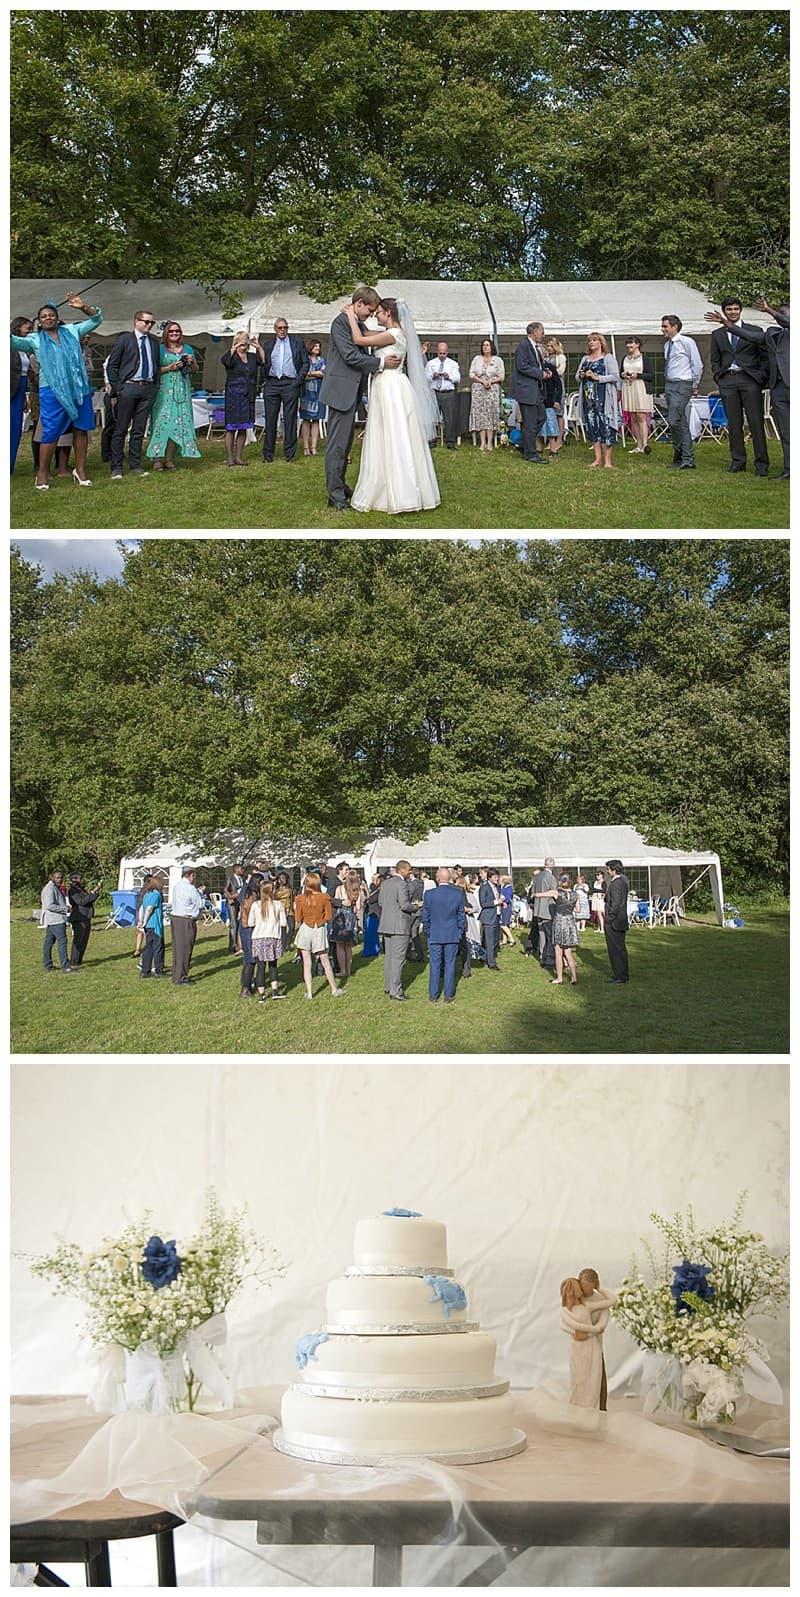 Richard & Elizabeth Scouting Wedding, Benjamin Wetherall Photography0027